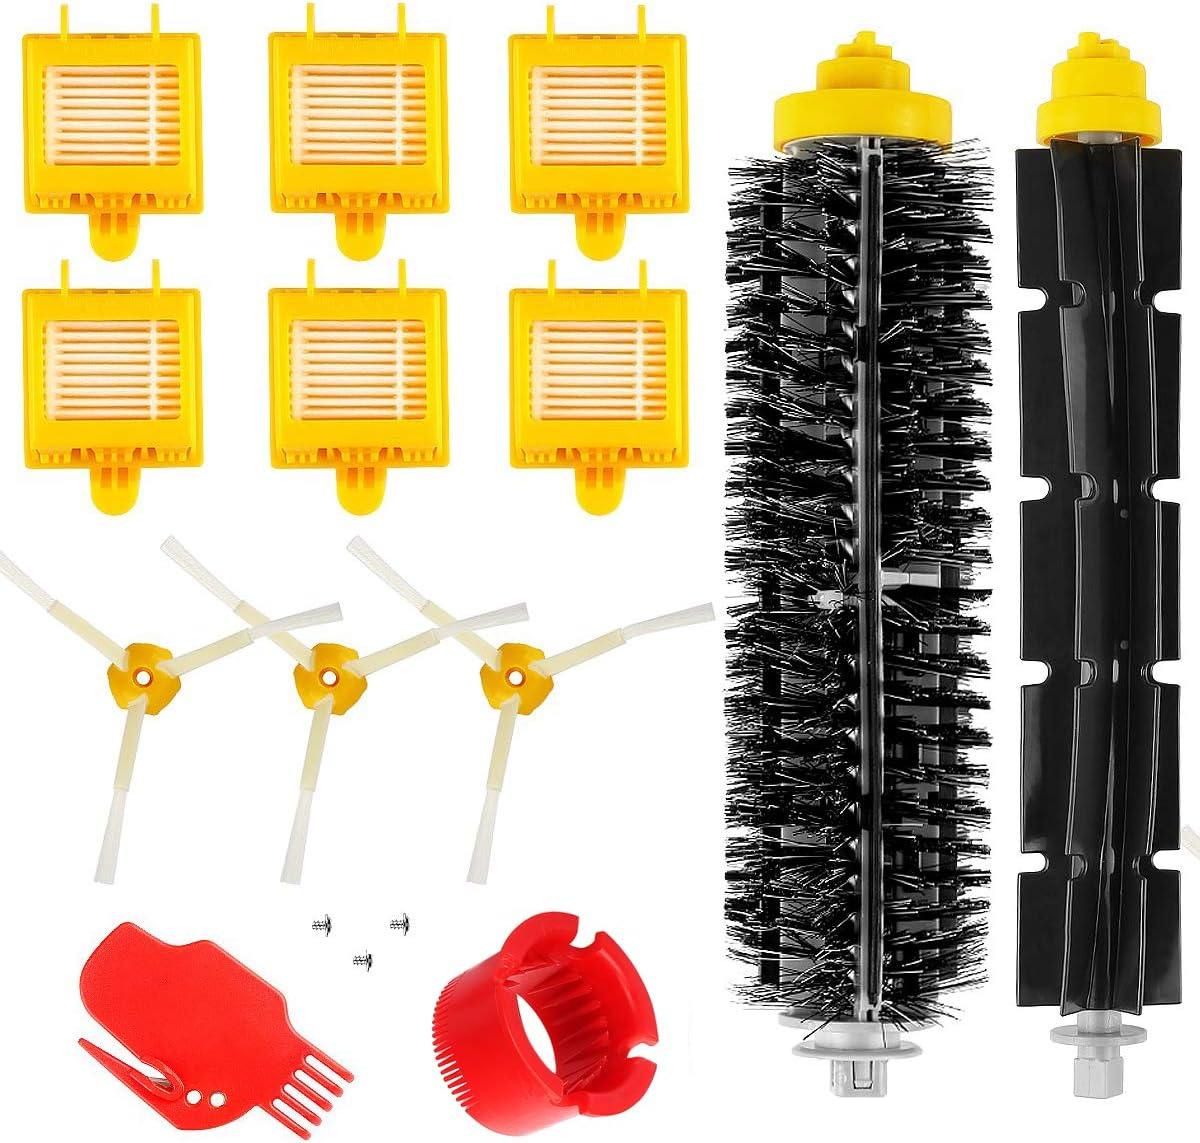 POWER-XWT Roomba Repuestos para IRobot Roomba 700 Series Reemplazar Filtro Roomba Brushes